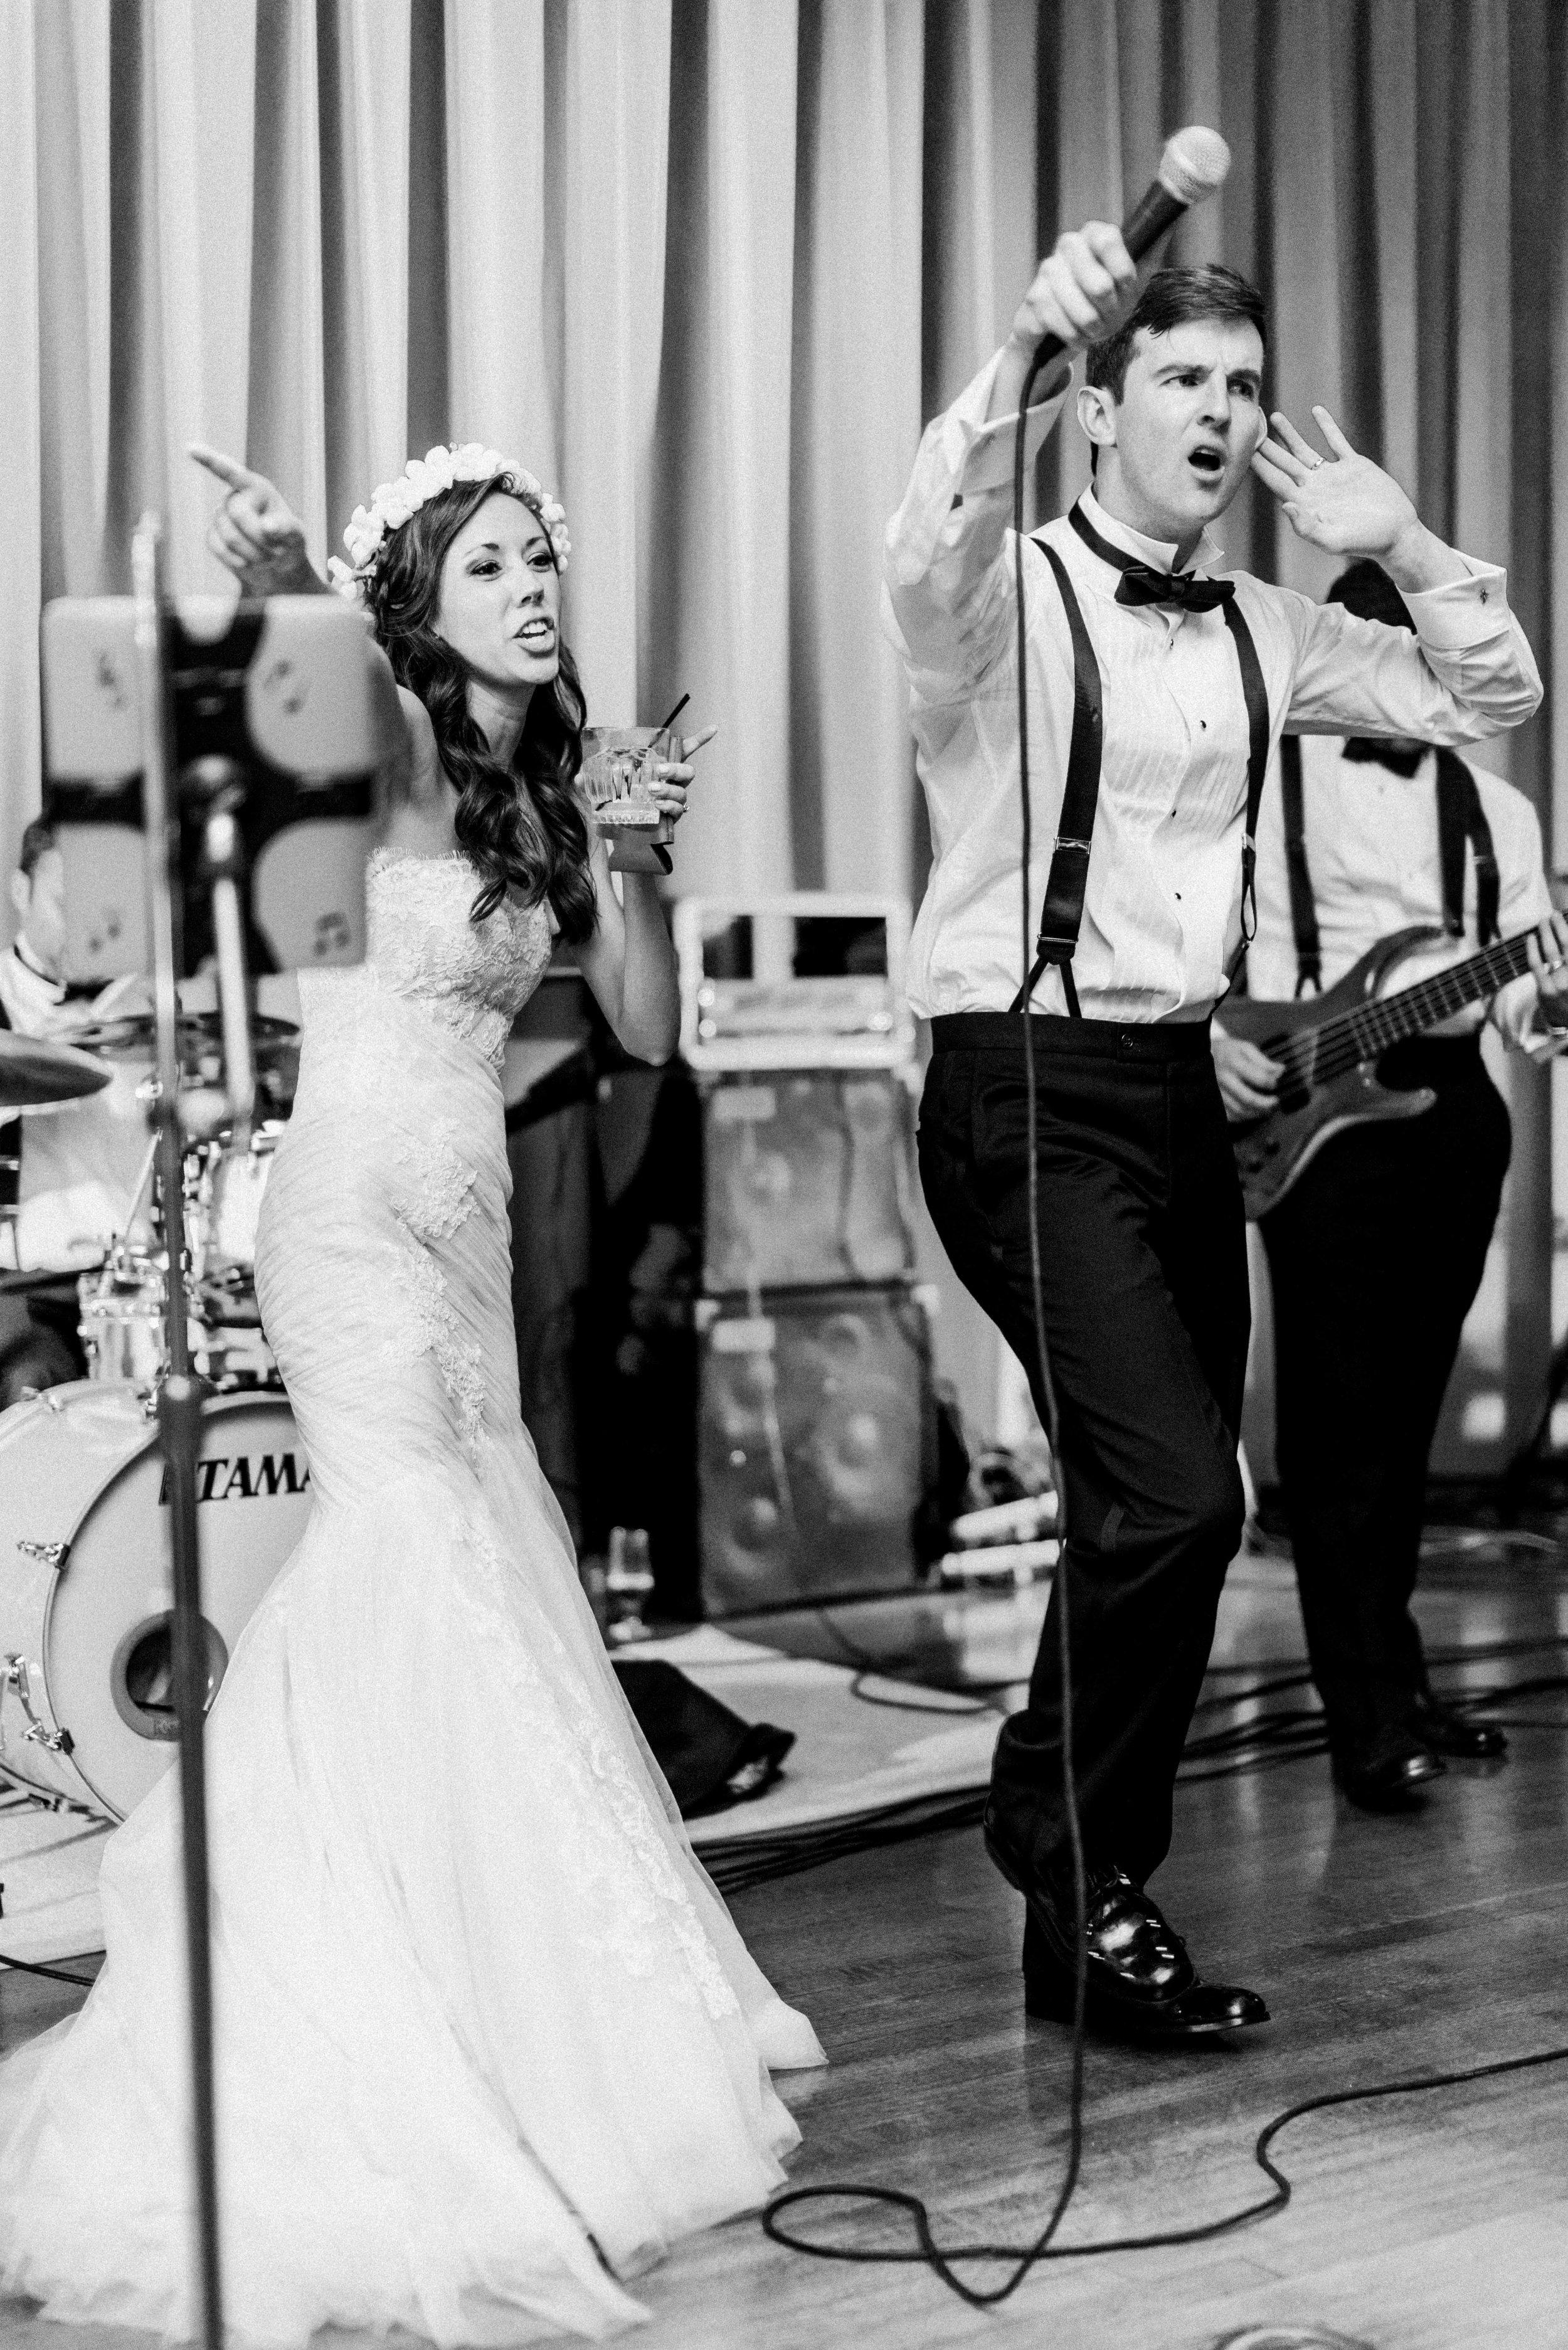 St.-Philip-Presbyterian-Church-Houston-Wedding-Ceremony-The-Junior-League-Of-Houston-Reception-Dana-Fernandez-Photography-Fine-Art-Film-36.jpg